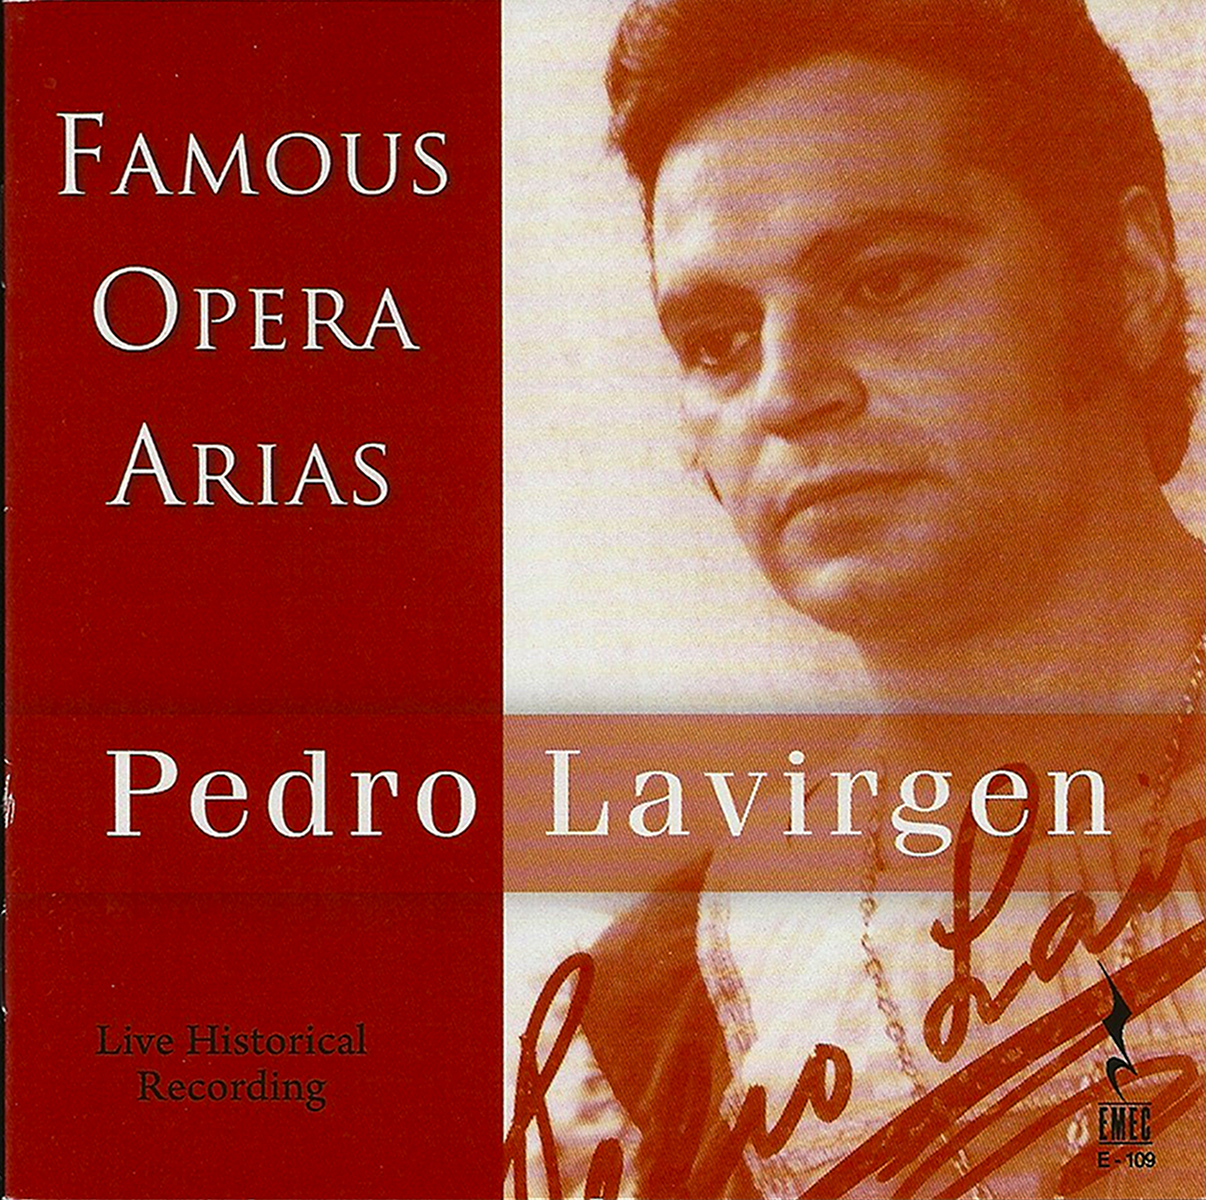 PEDRO LAVIRGEN-FAMOUS OPERA ARIAS